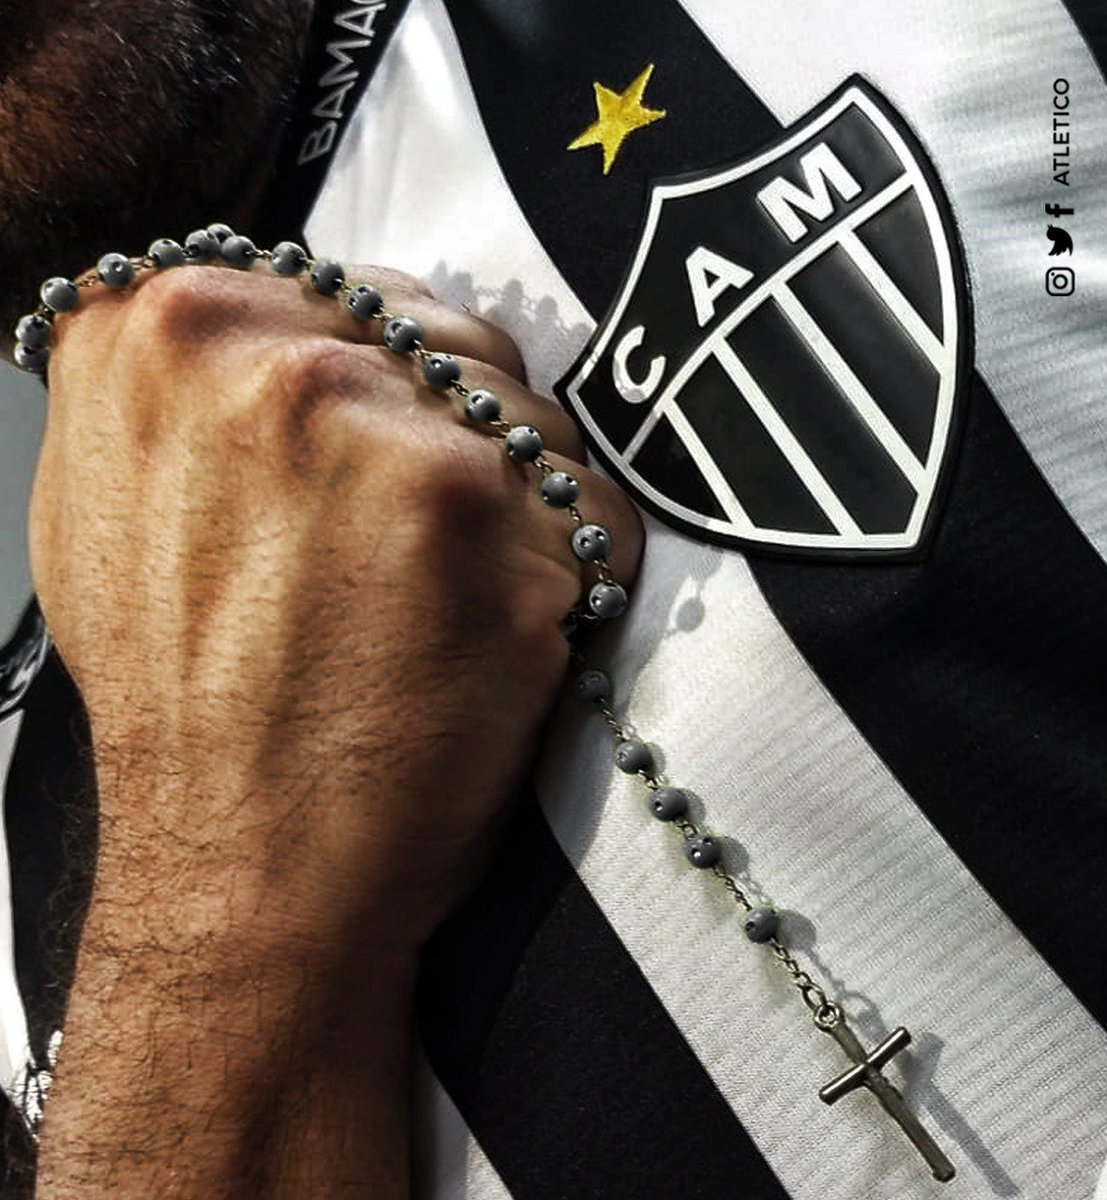 Atlético's photo on #ContinenteAtleticano